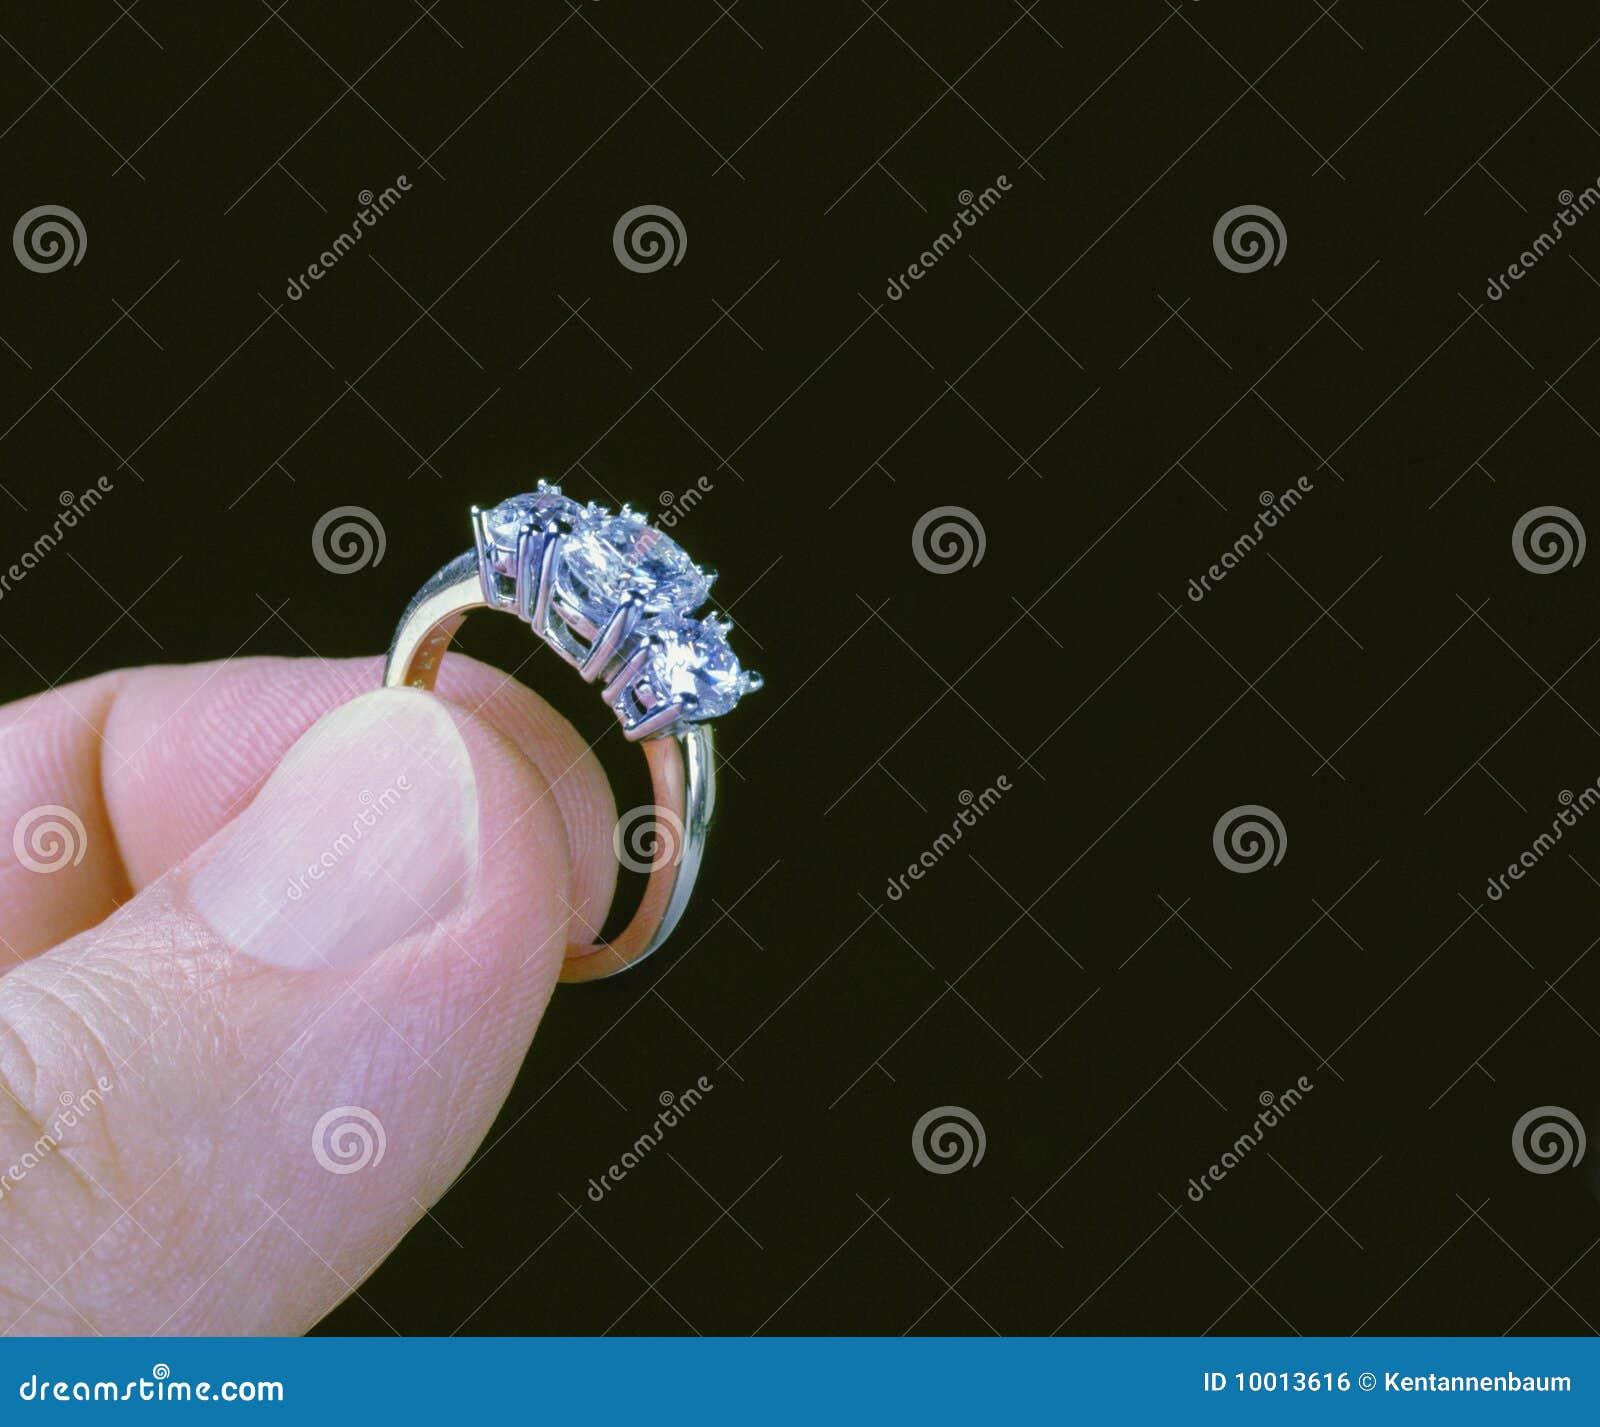 Hand holding diamond ring